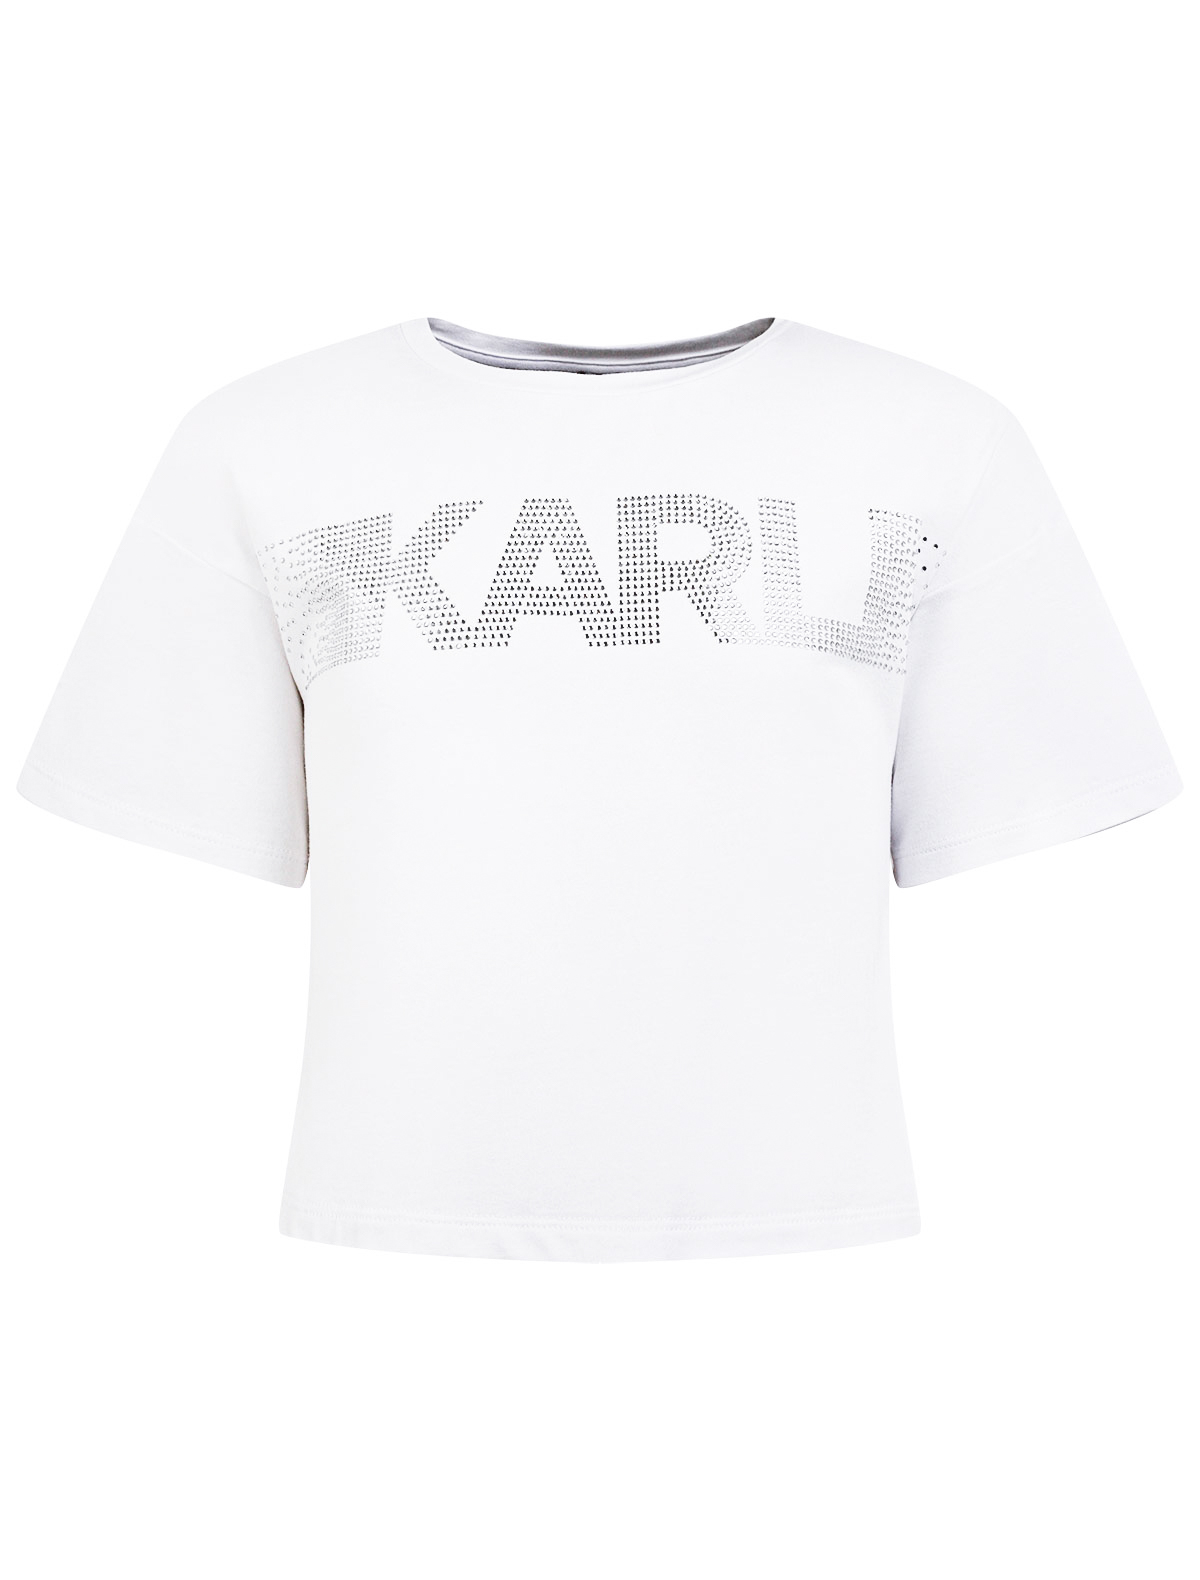 Купить 2310927, Футболка KARL LAGERFELD, белый, Женский, 1134609175278